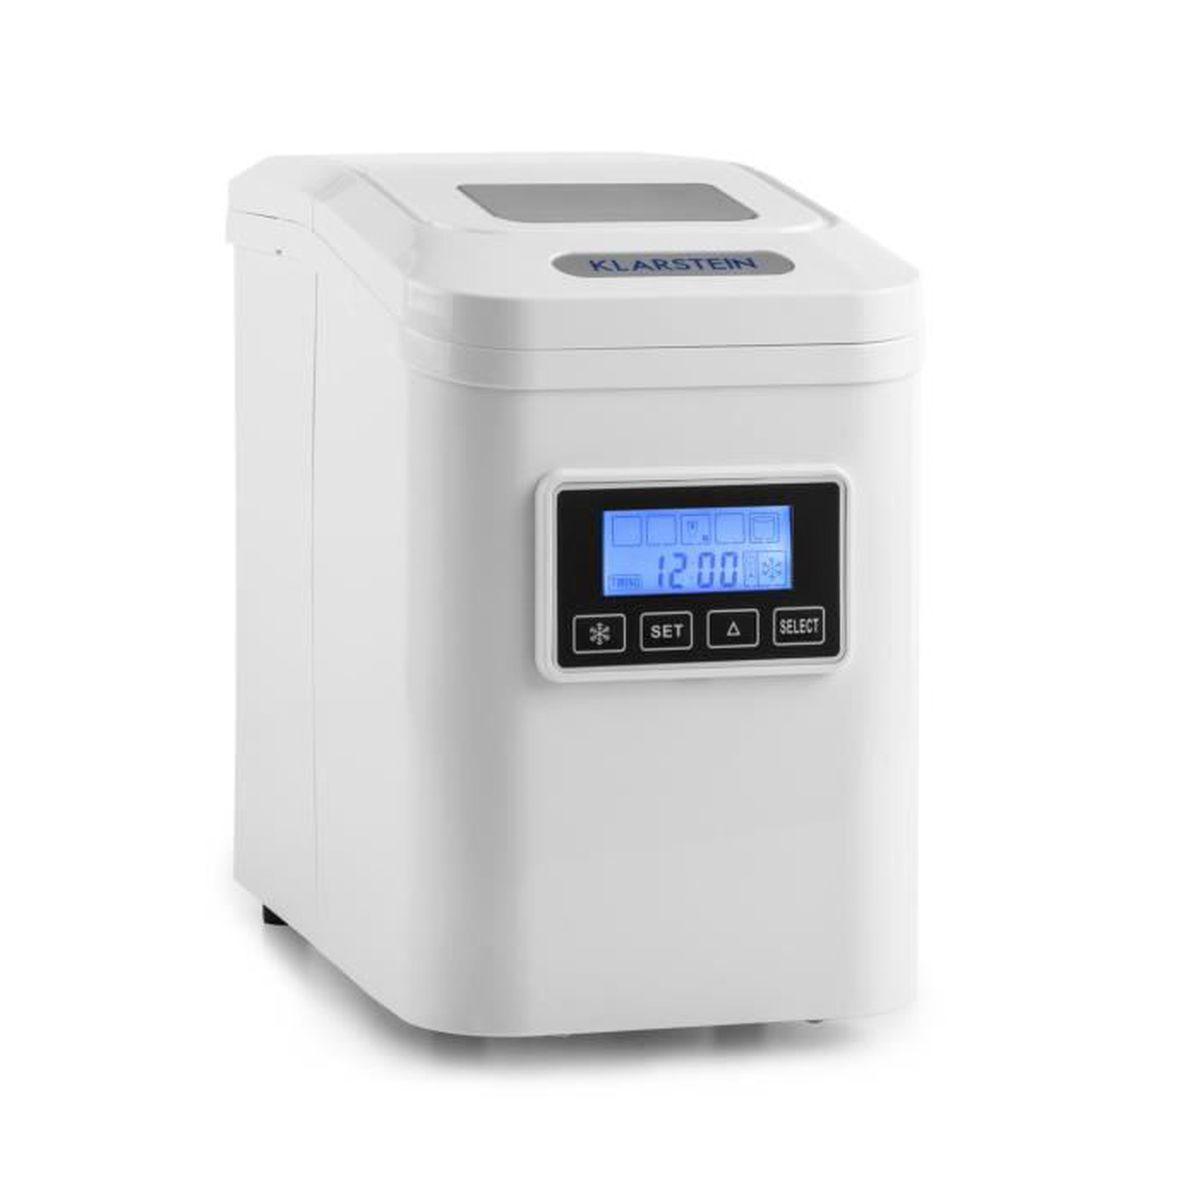 Bon Coin Robot Patissier klarstein lannister machine à glaçons machine à glace 10 kg